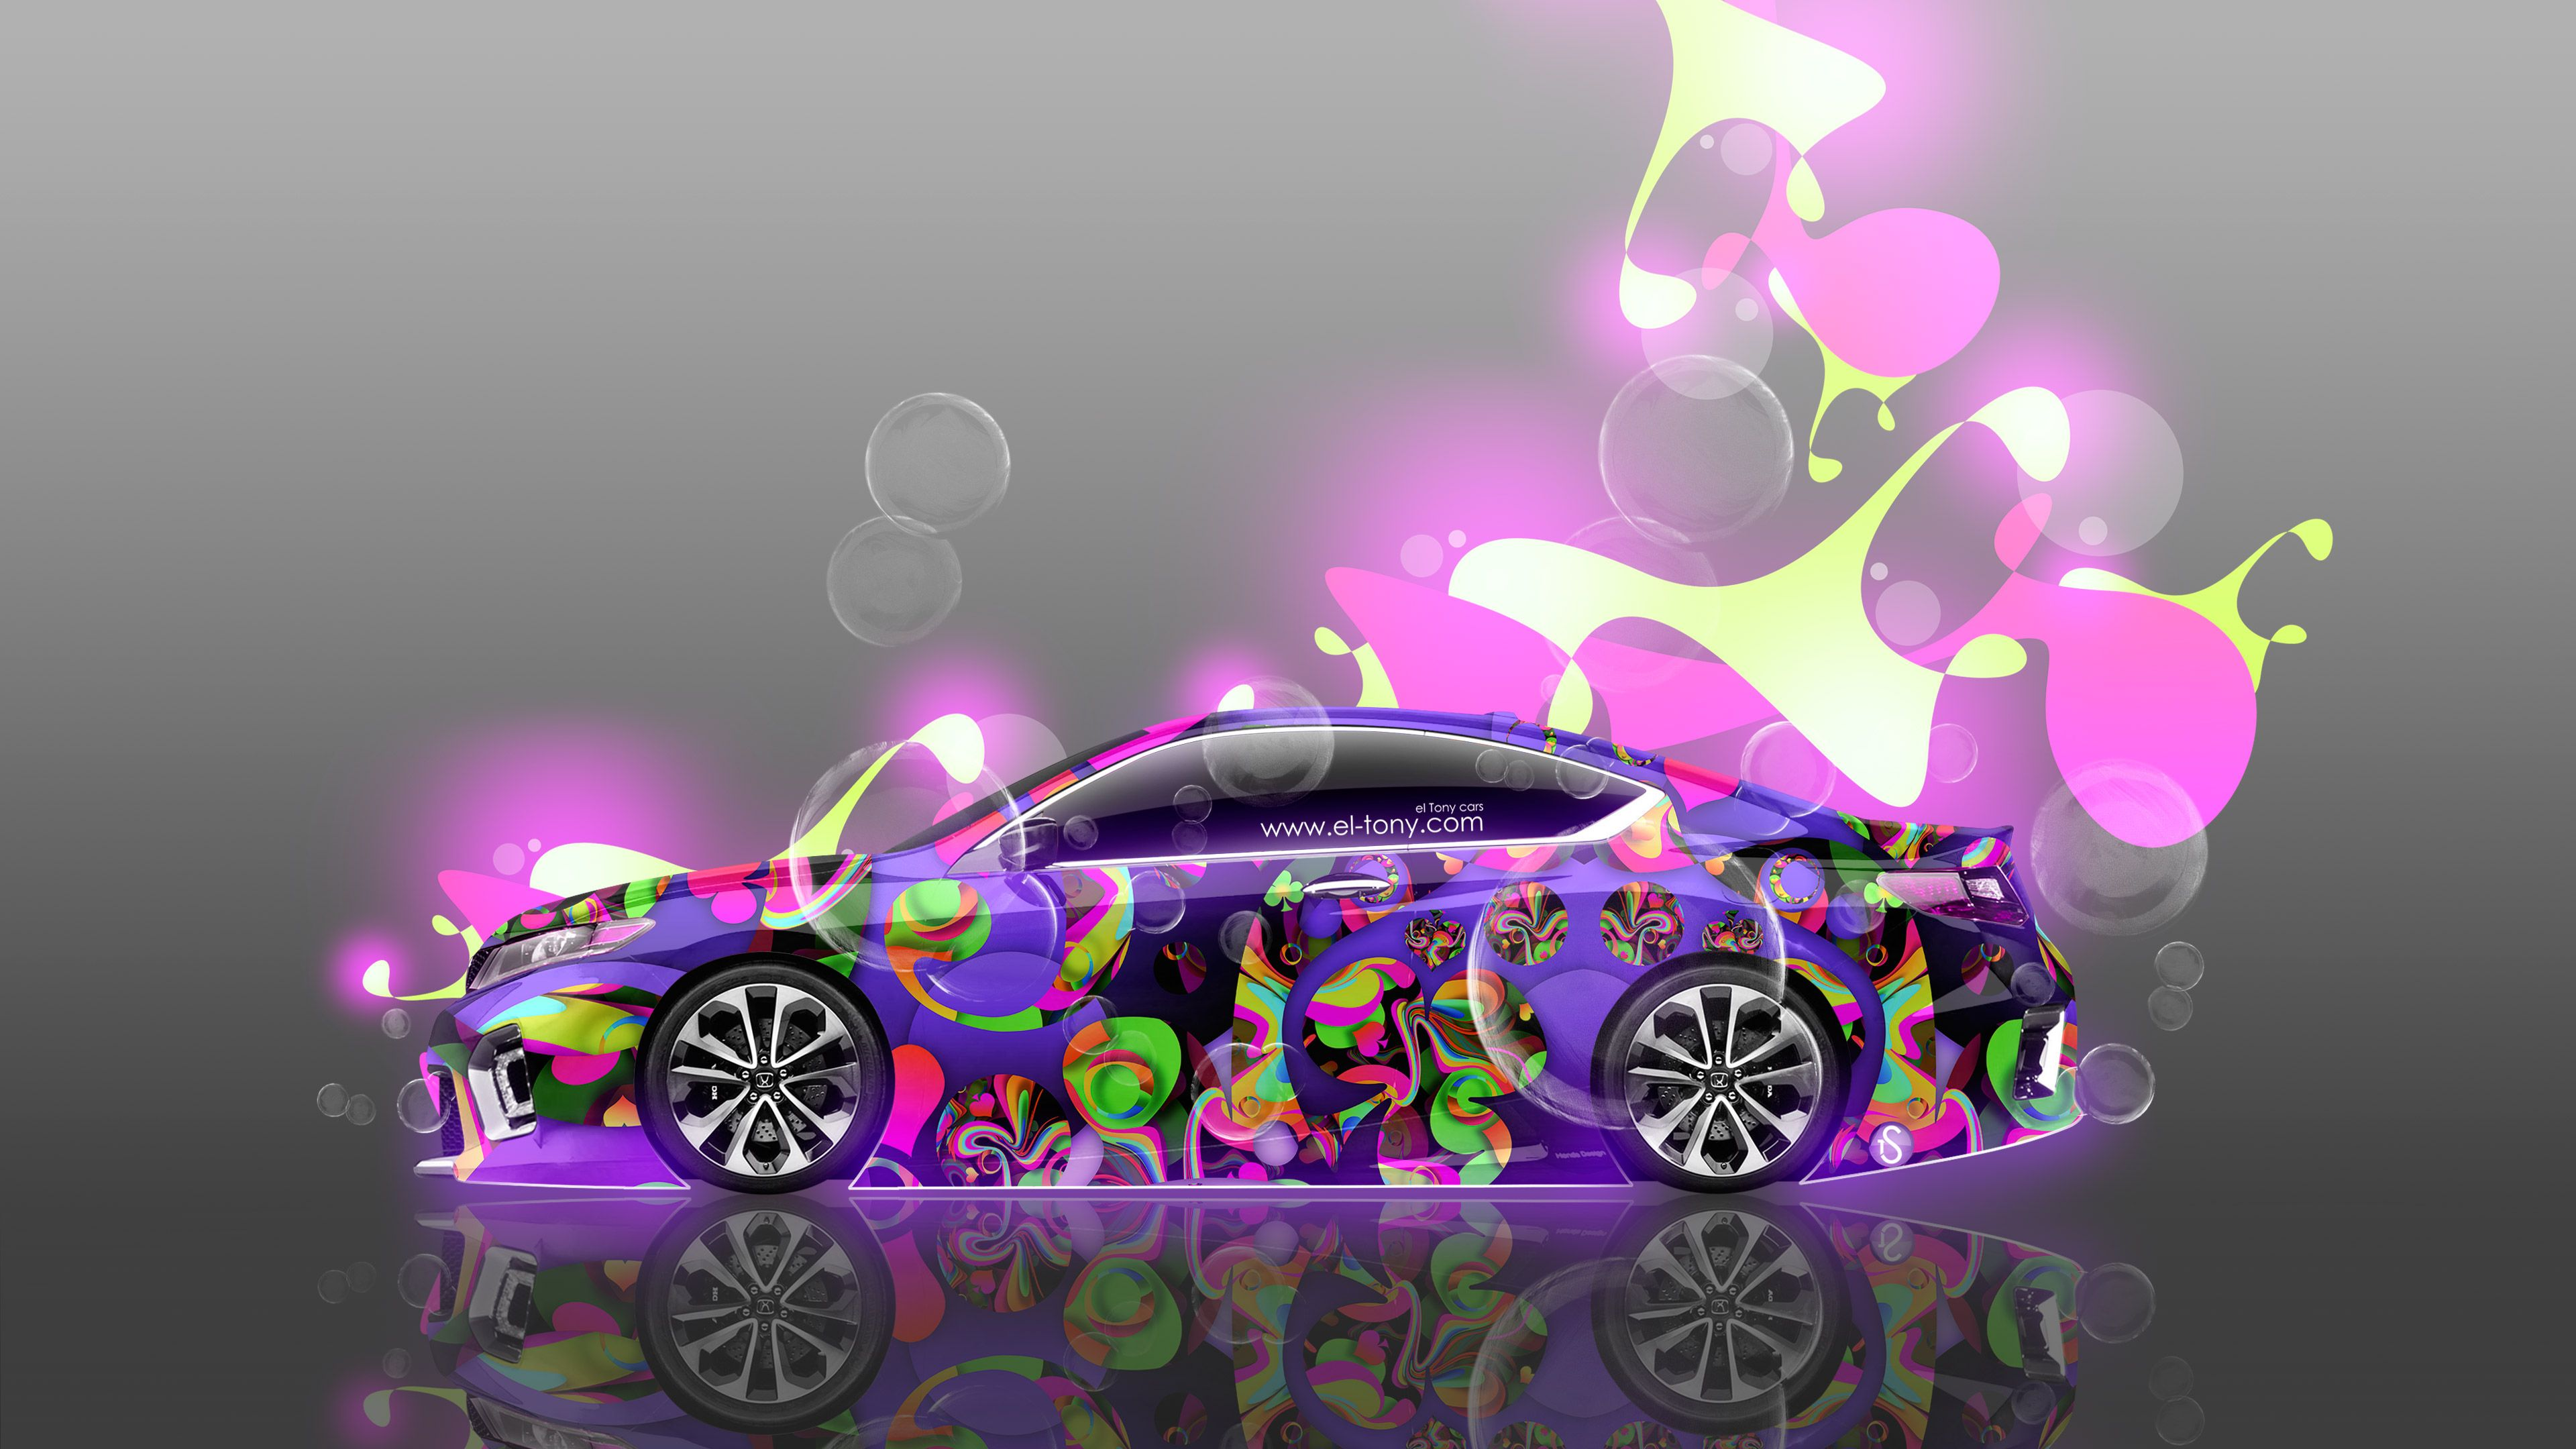 Honda-Accord-Coupe-JDM-Side-Super-Abstract-Aerography-Car